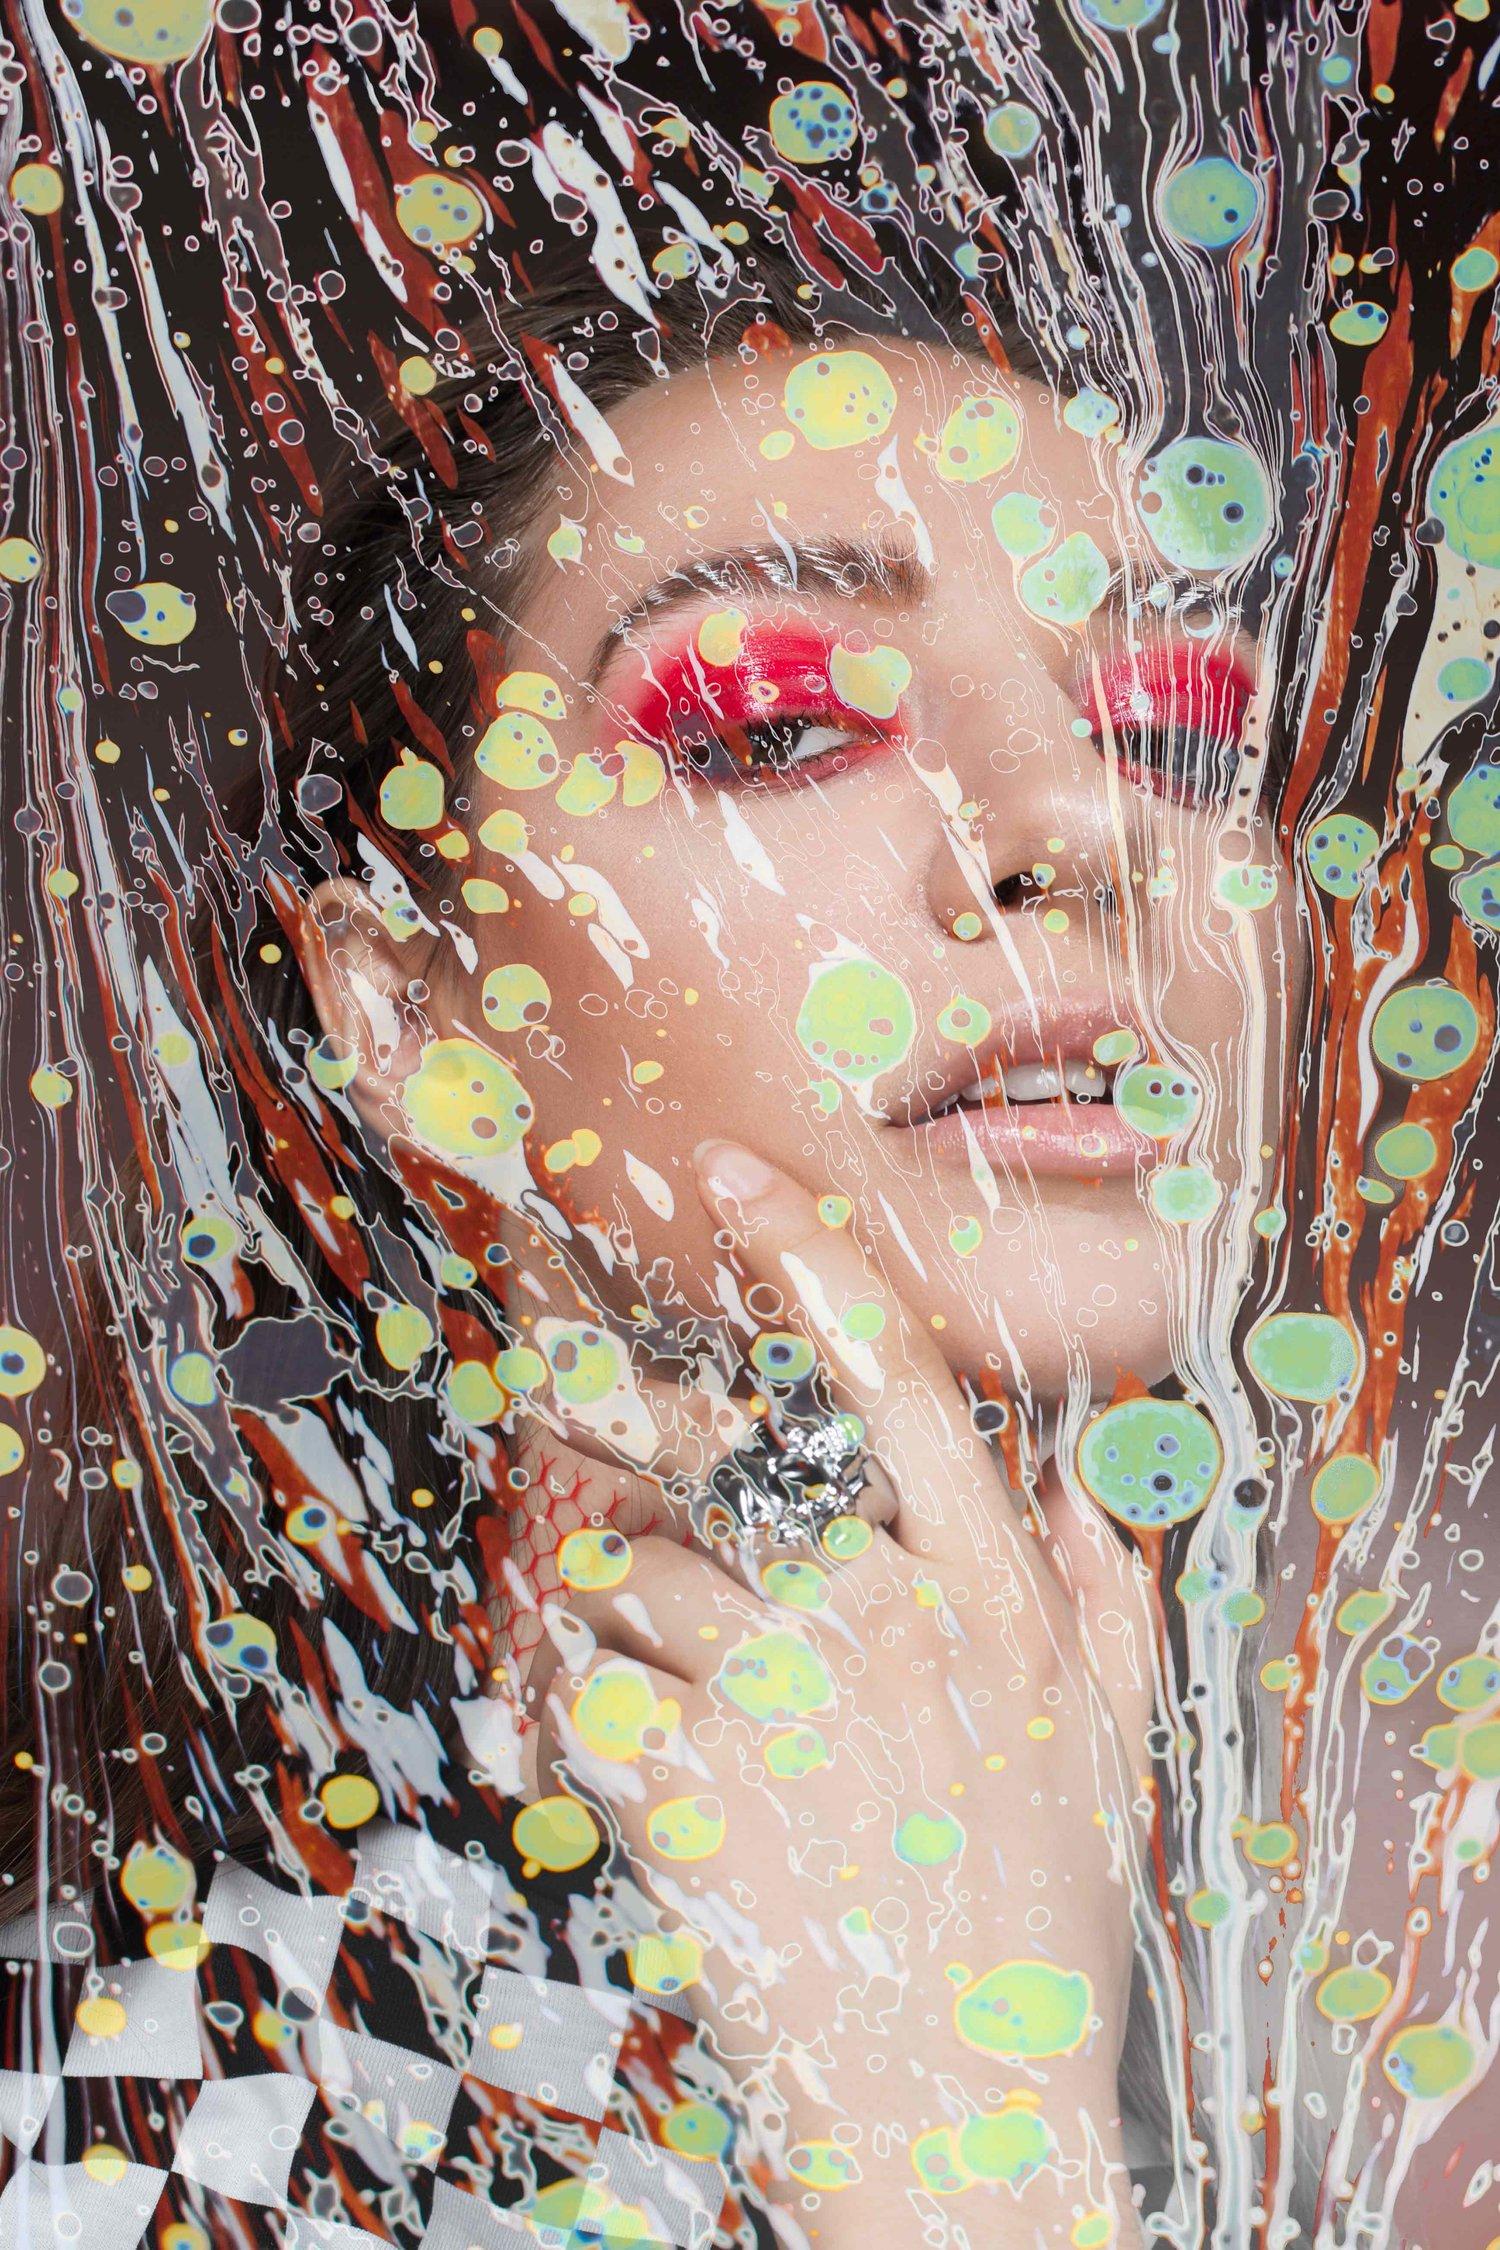 want management model julia boncoddo Iconic portrait by commercial fashion artist photographer justin atkins.jpg.jpg.jpg